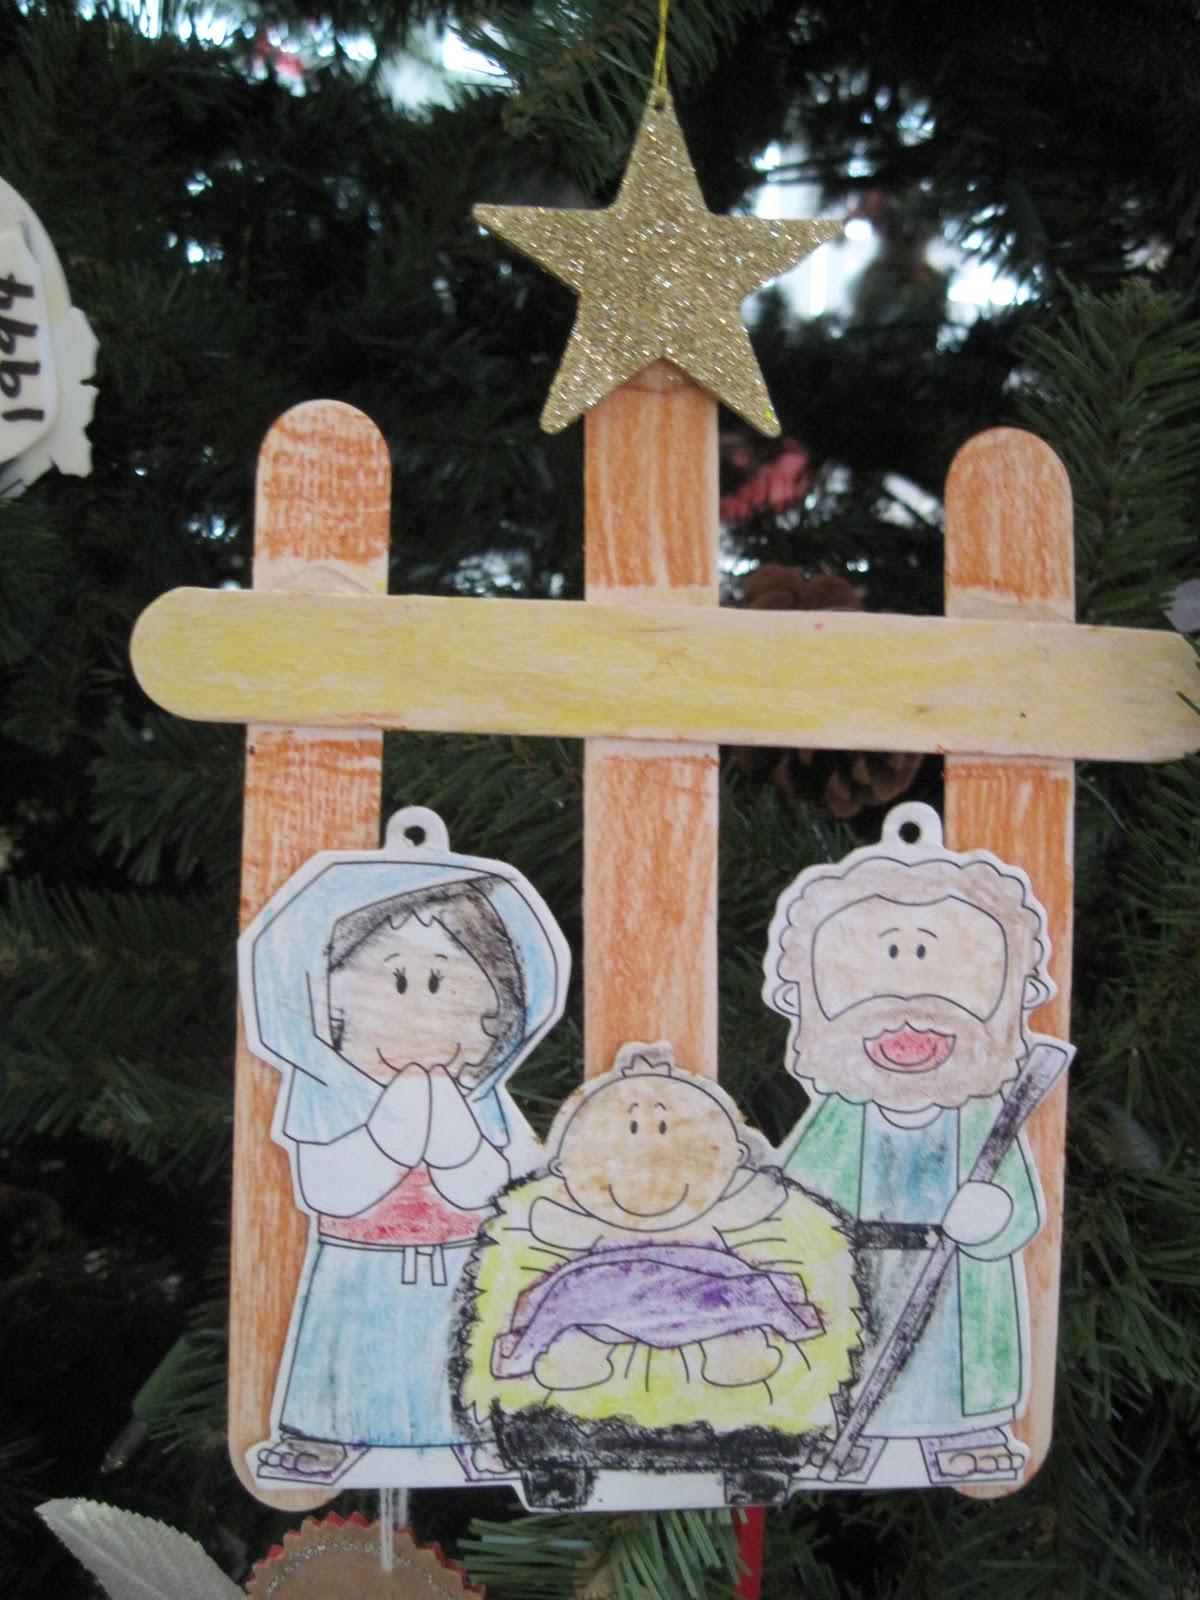 Grandma S Little Pearls December